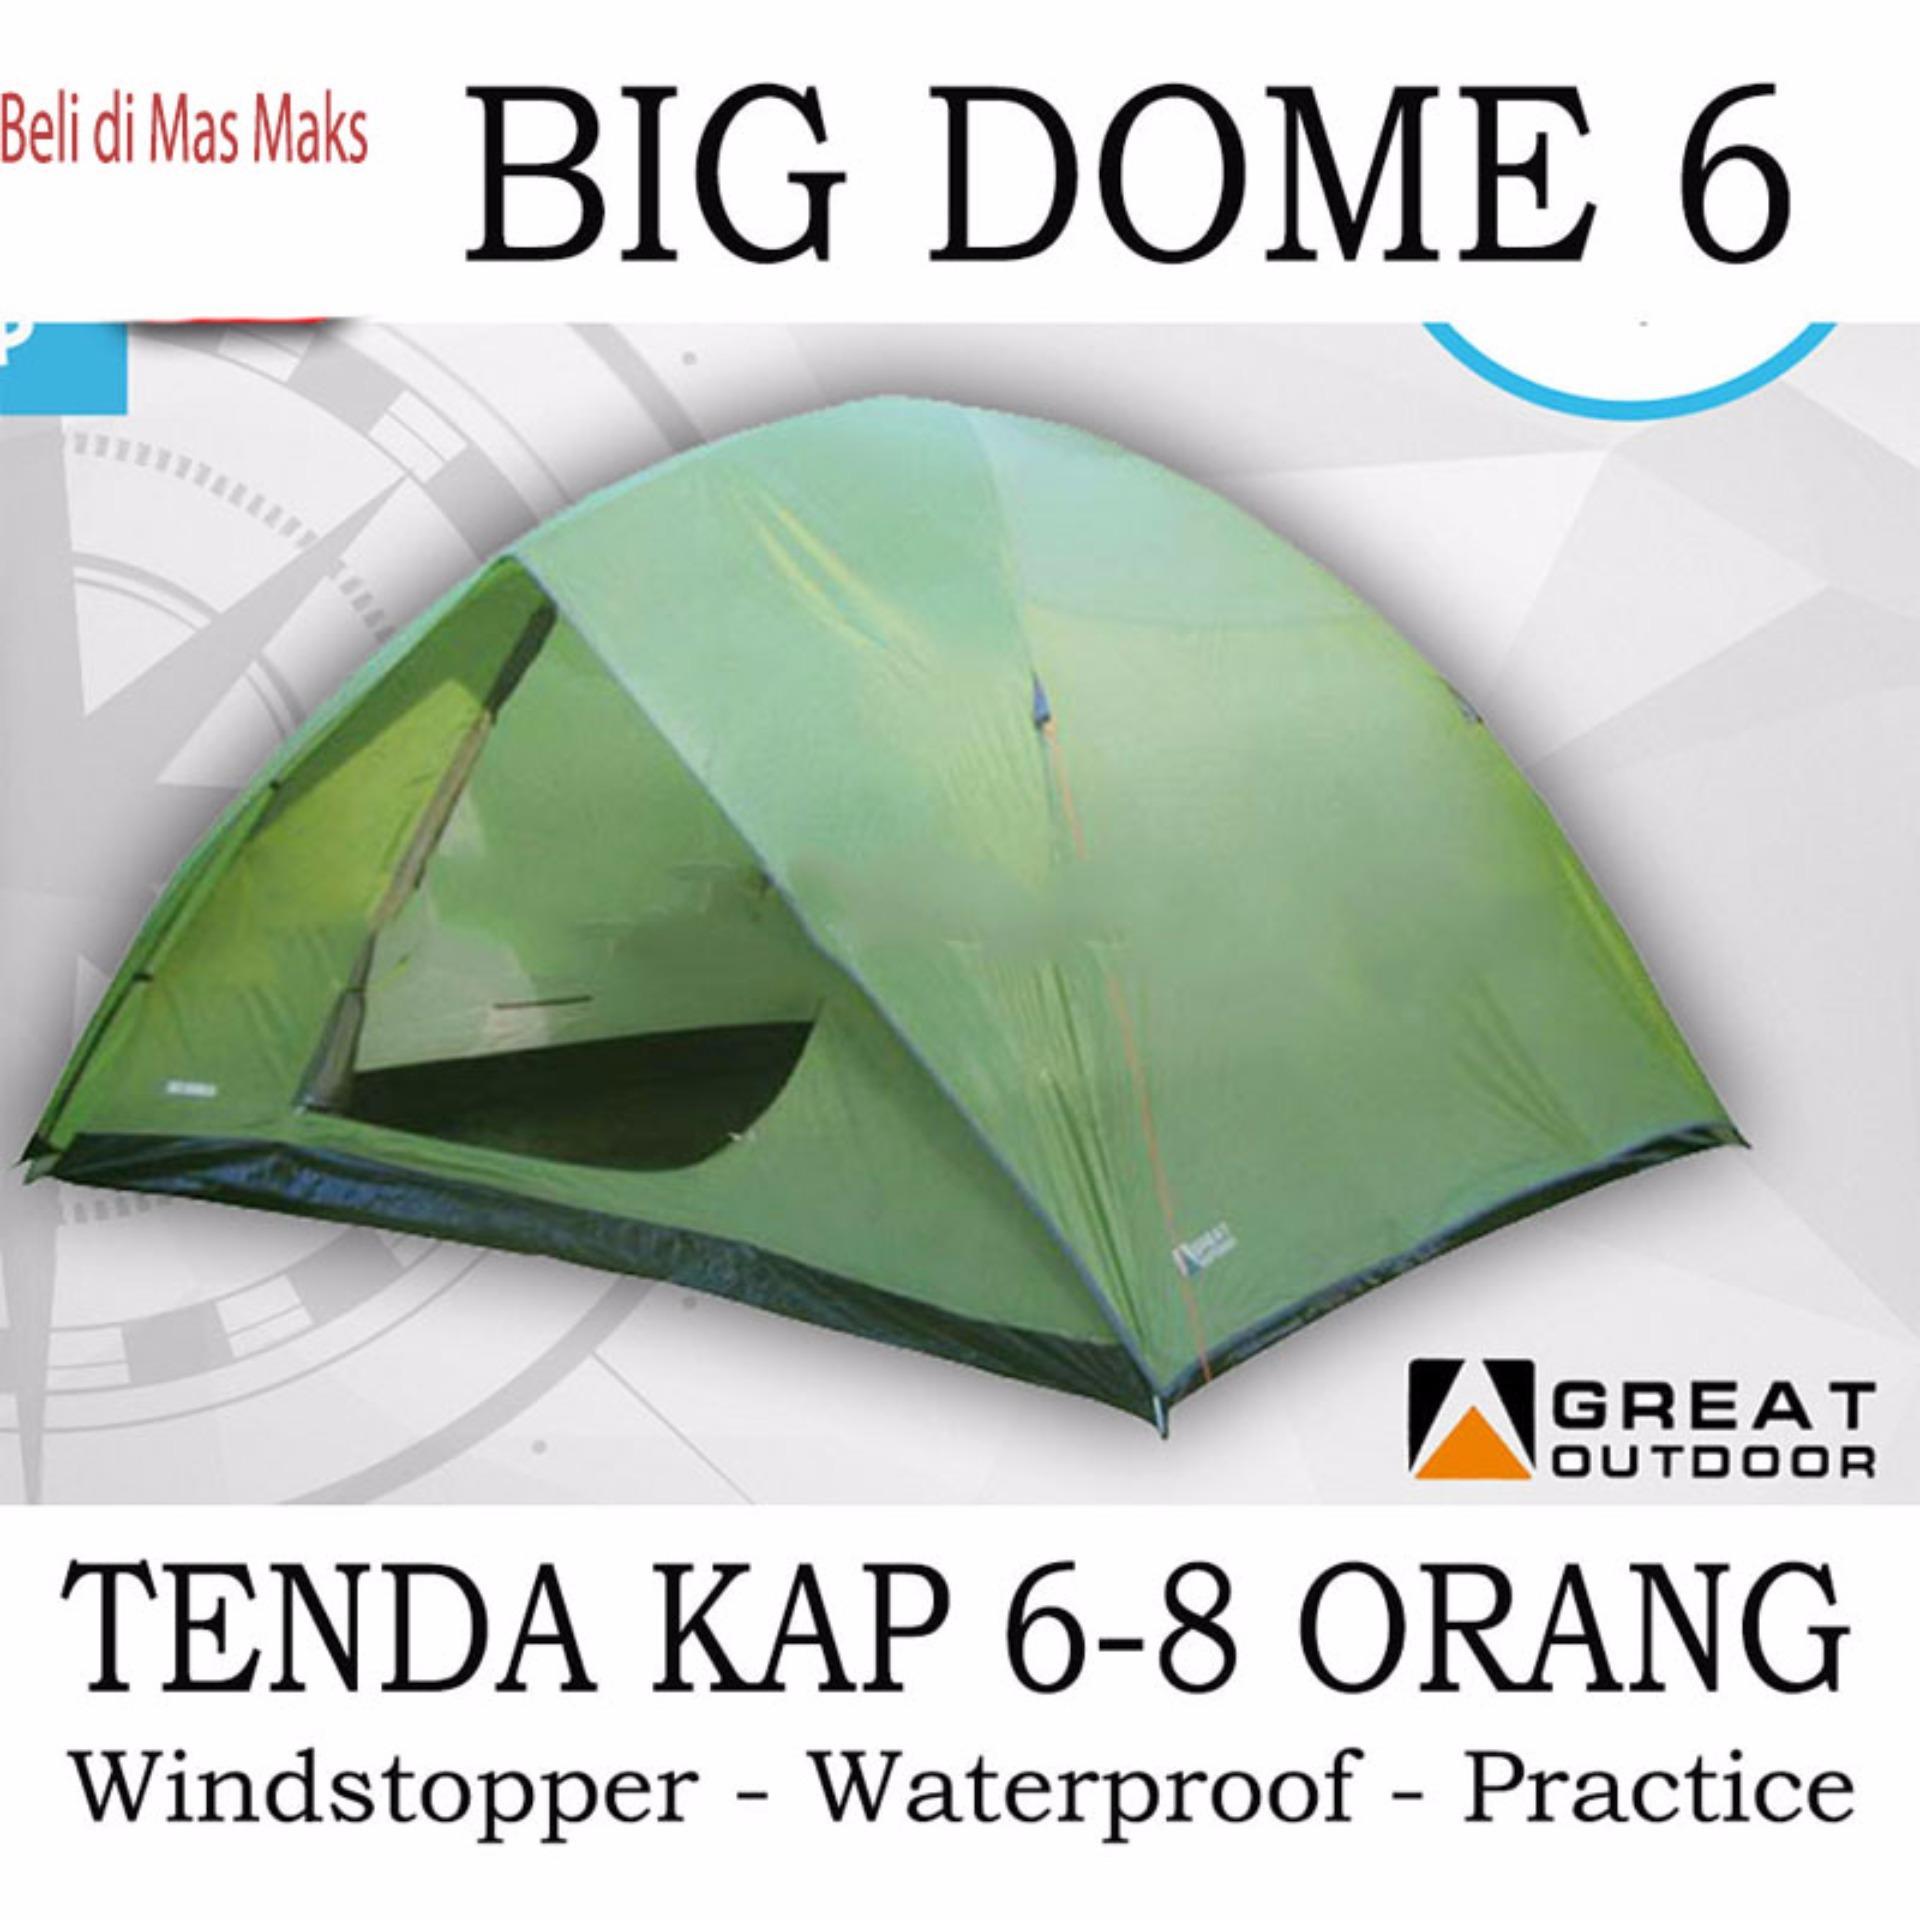 Tenda Camping Big Dome Great Outdoor Kap 6 - 8 Orang